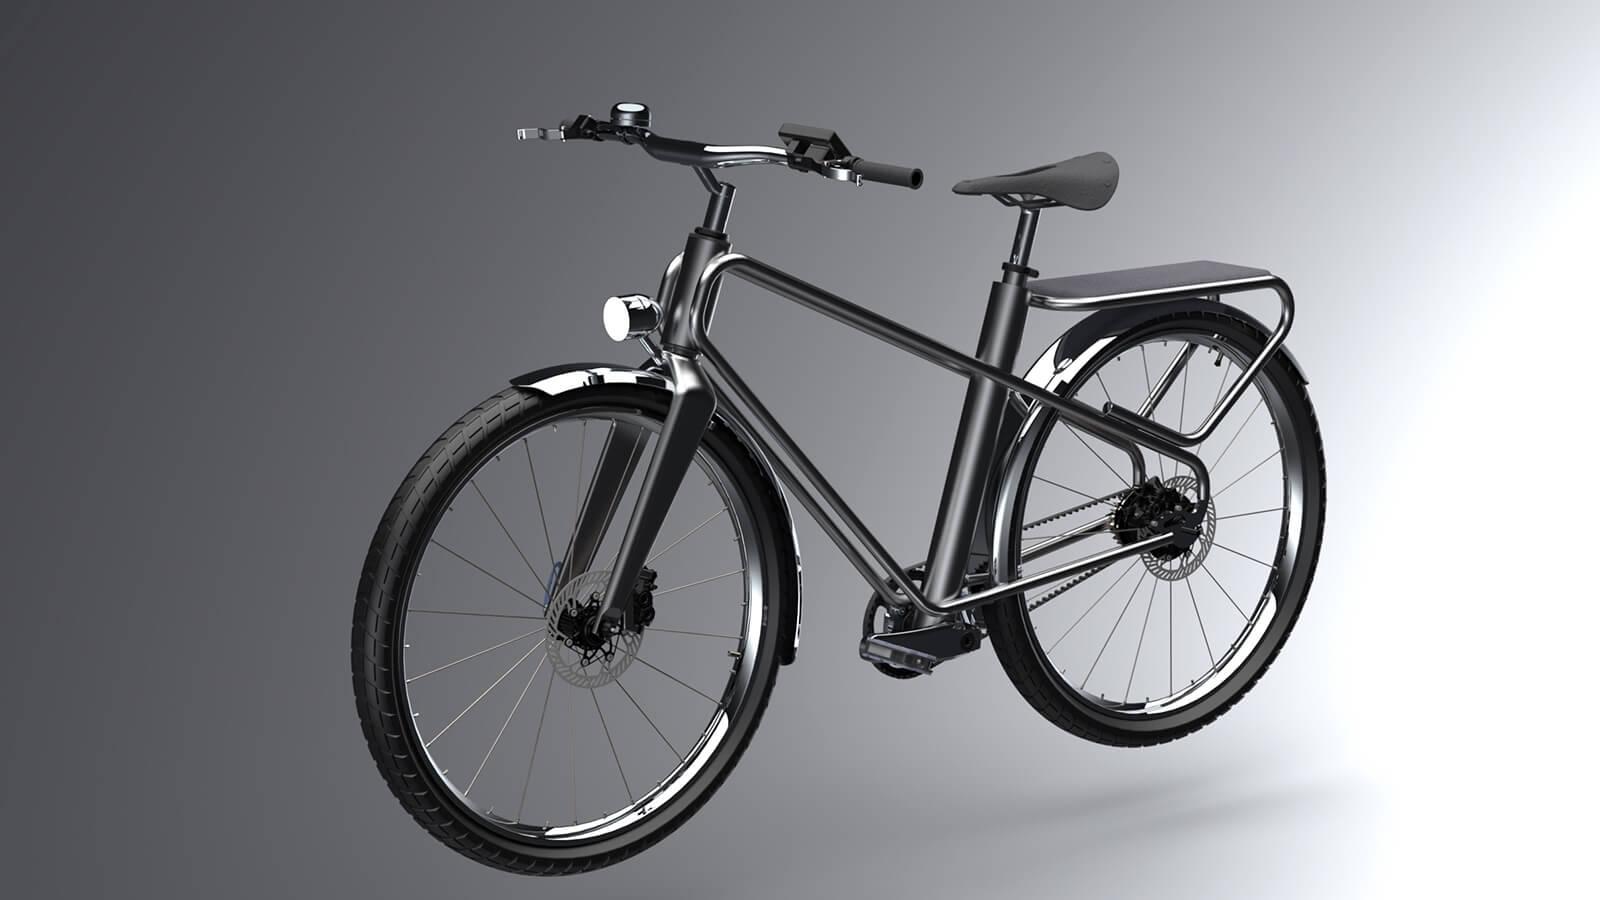 My new concept of an inexpensive city e-bike looks like a regular bike